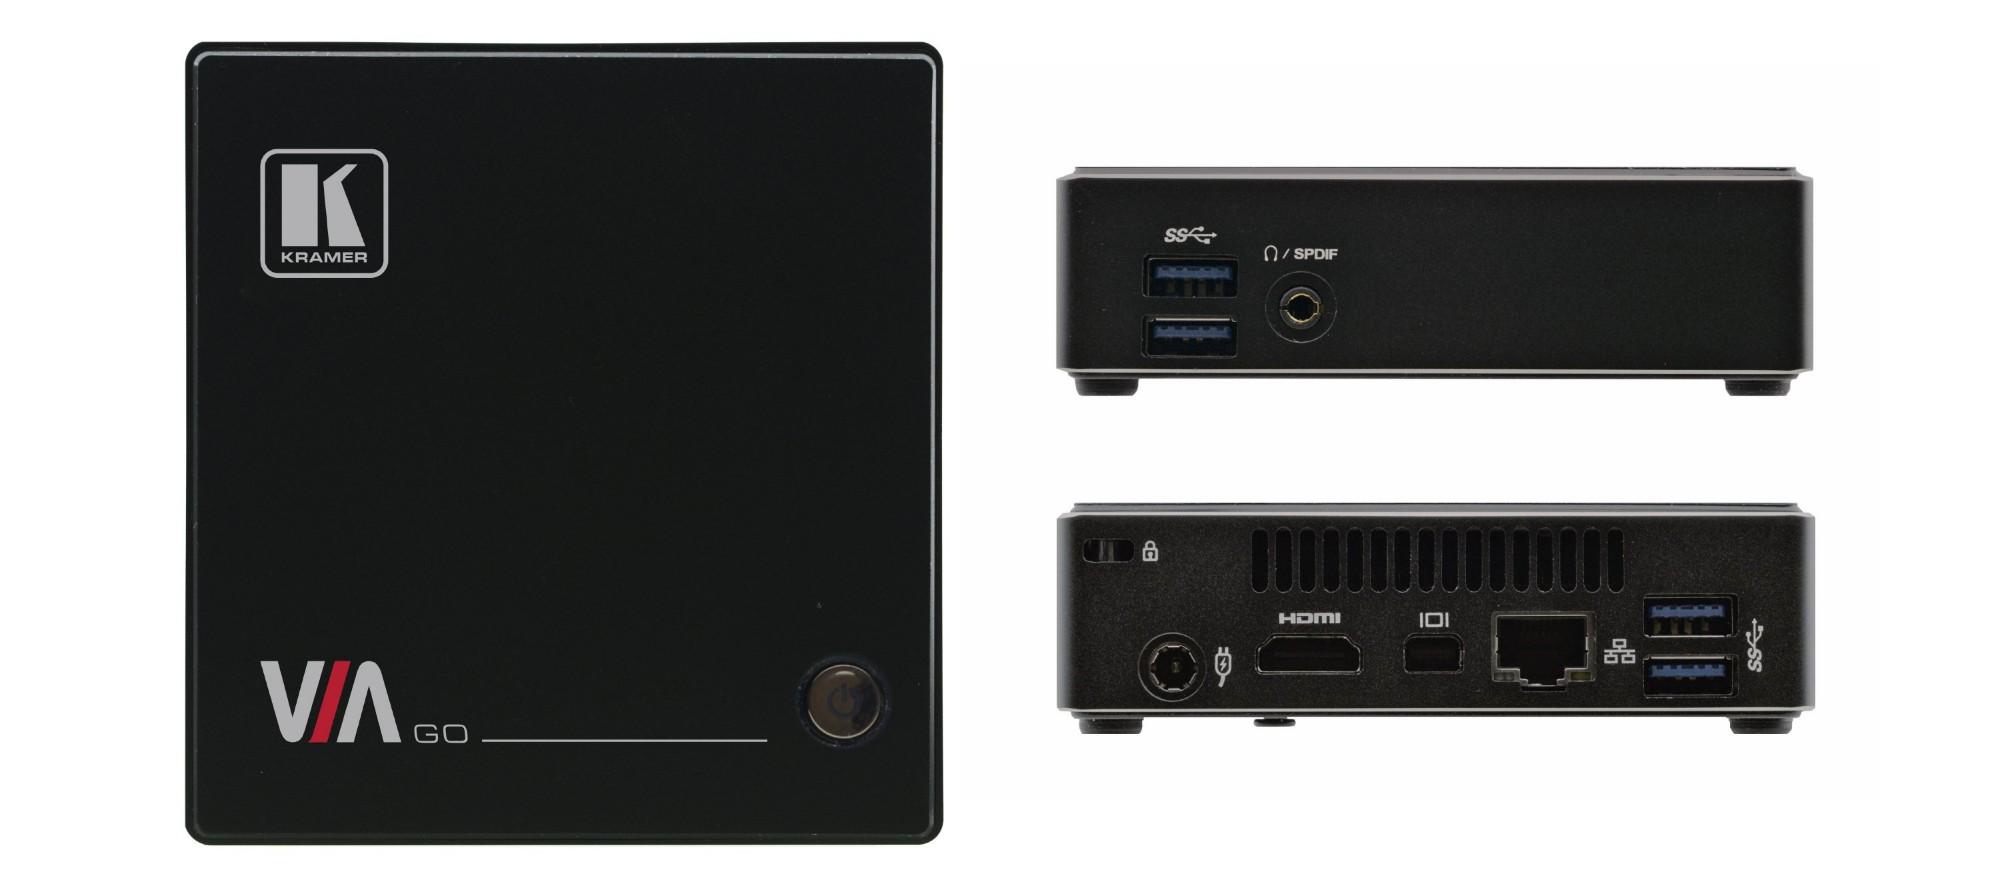 Kramer Electronics VIA GO wireless presentation system Desktop HDMI